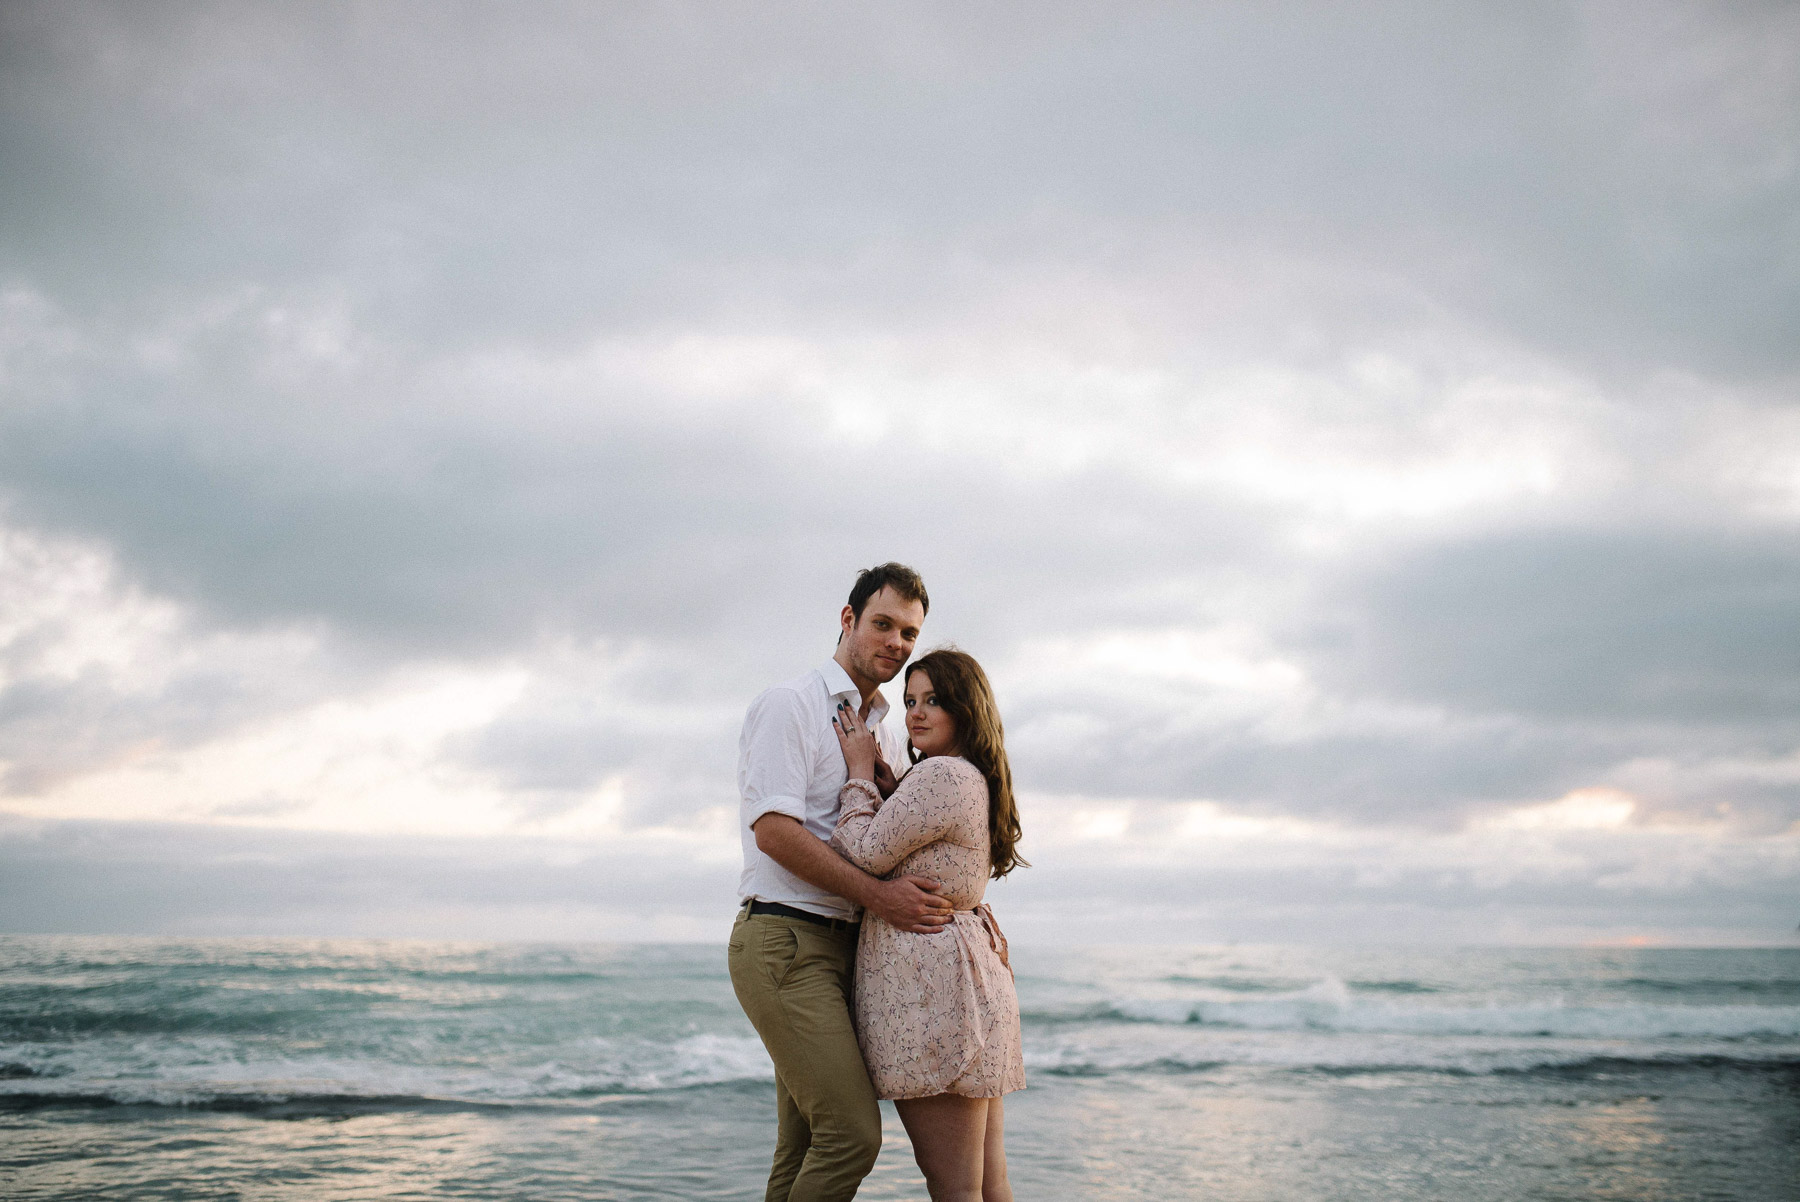 28-pre wedding photography amanda afton.jpg